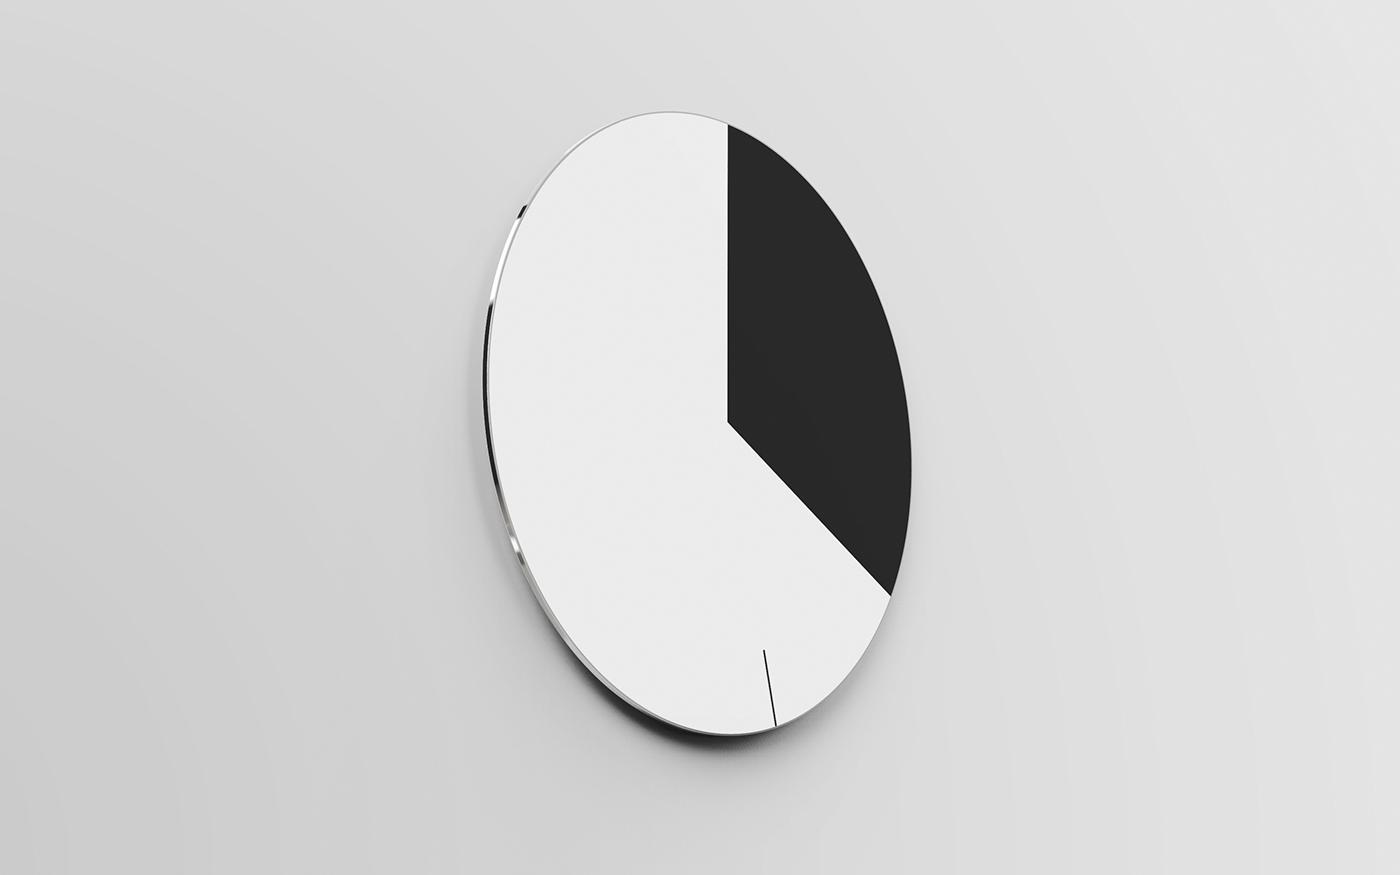 Adobe Portfolio clock circadian slice pie face watch e-ink e-paper kindle screen digital aluminum steel wall clock analog